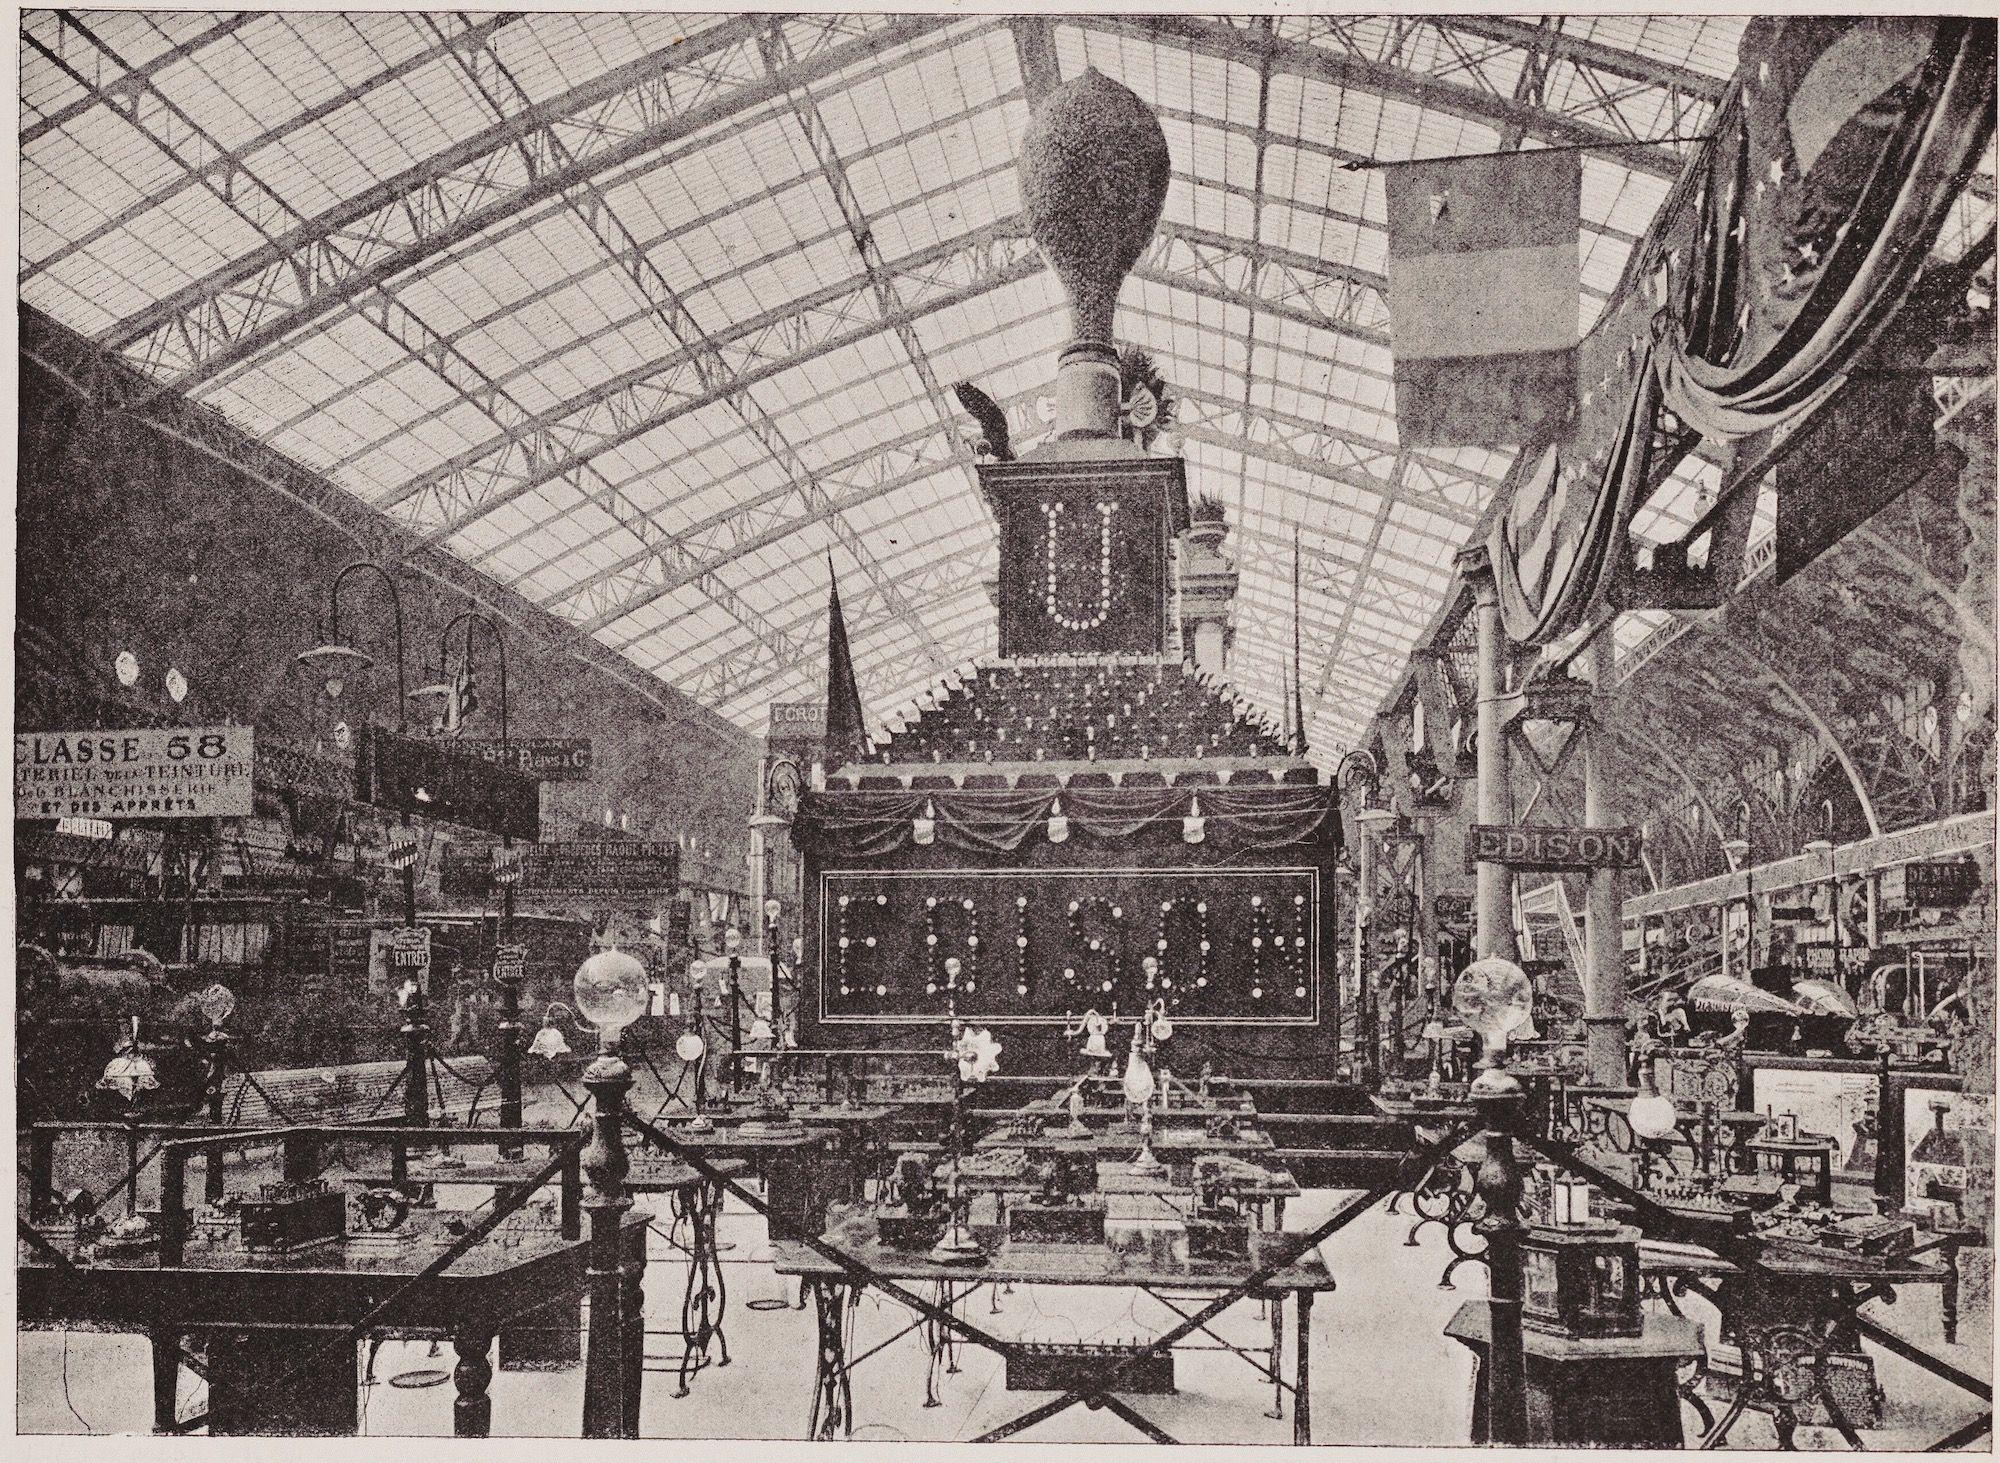 Thomas Edison Paris Exposition Display in 1889